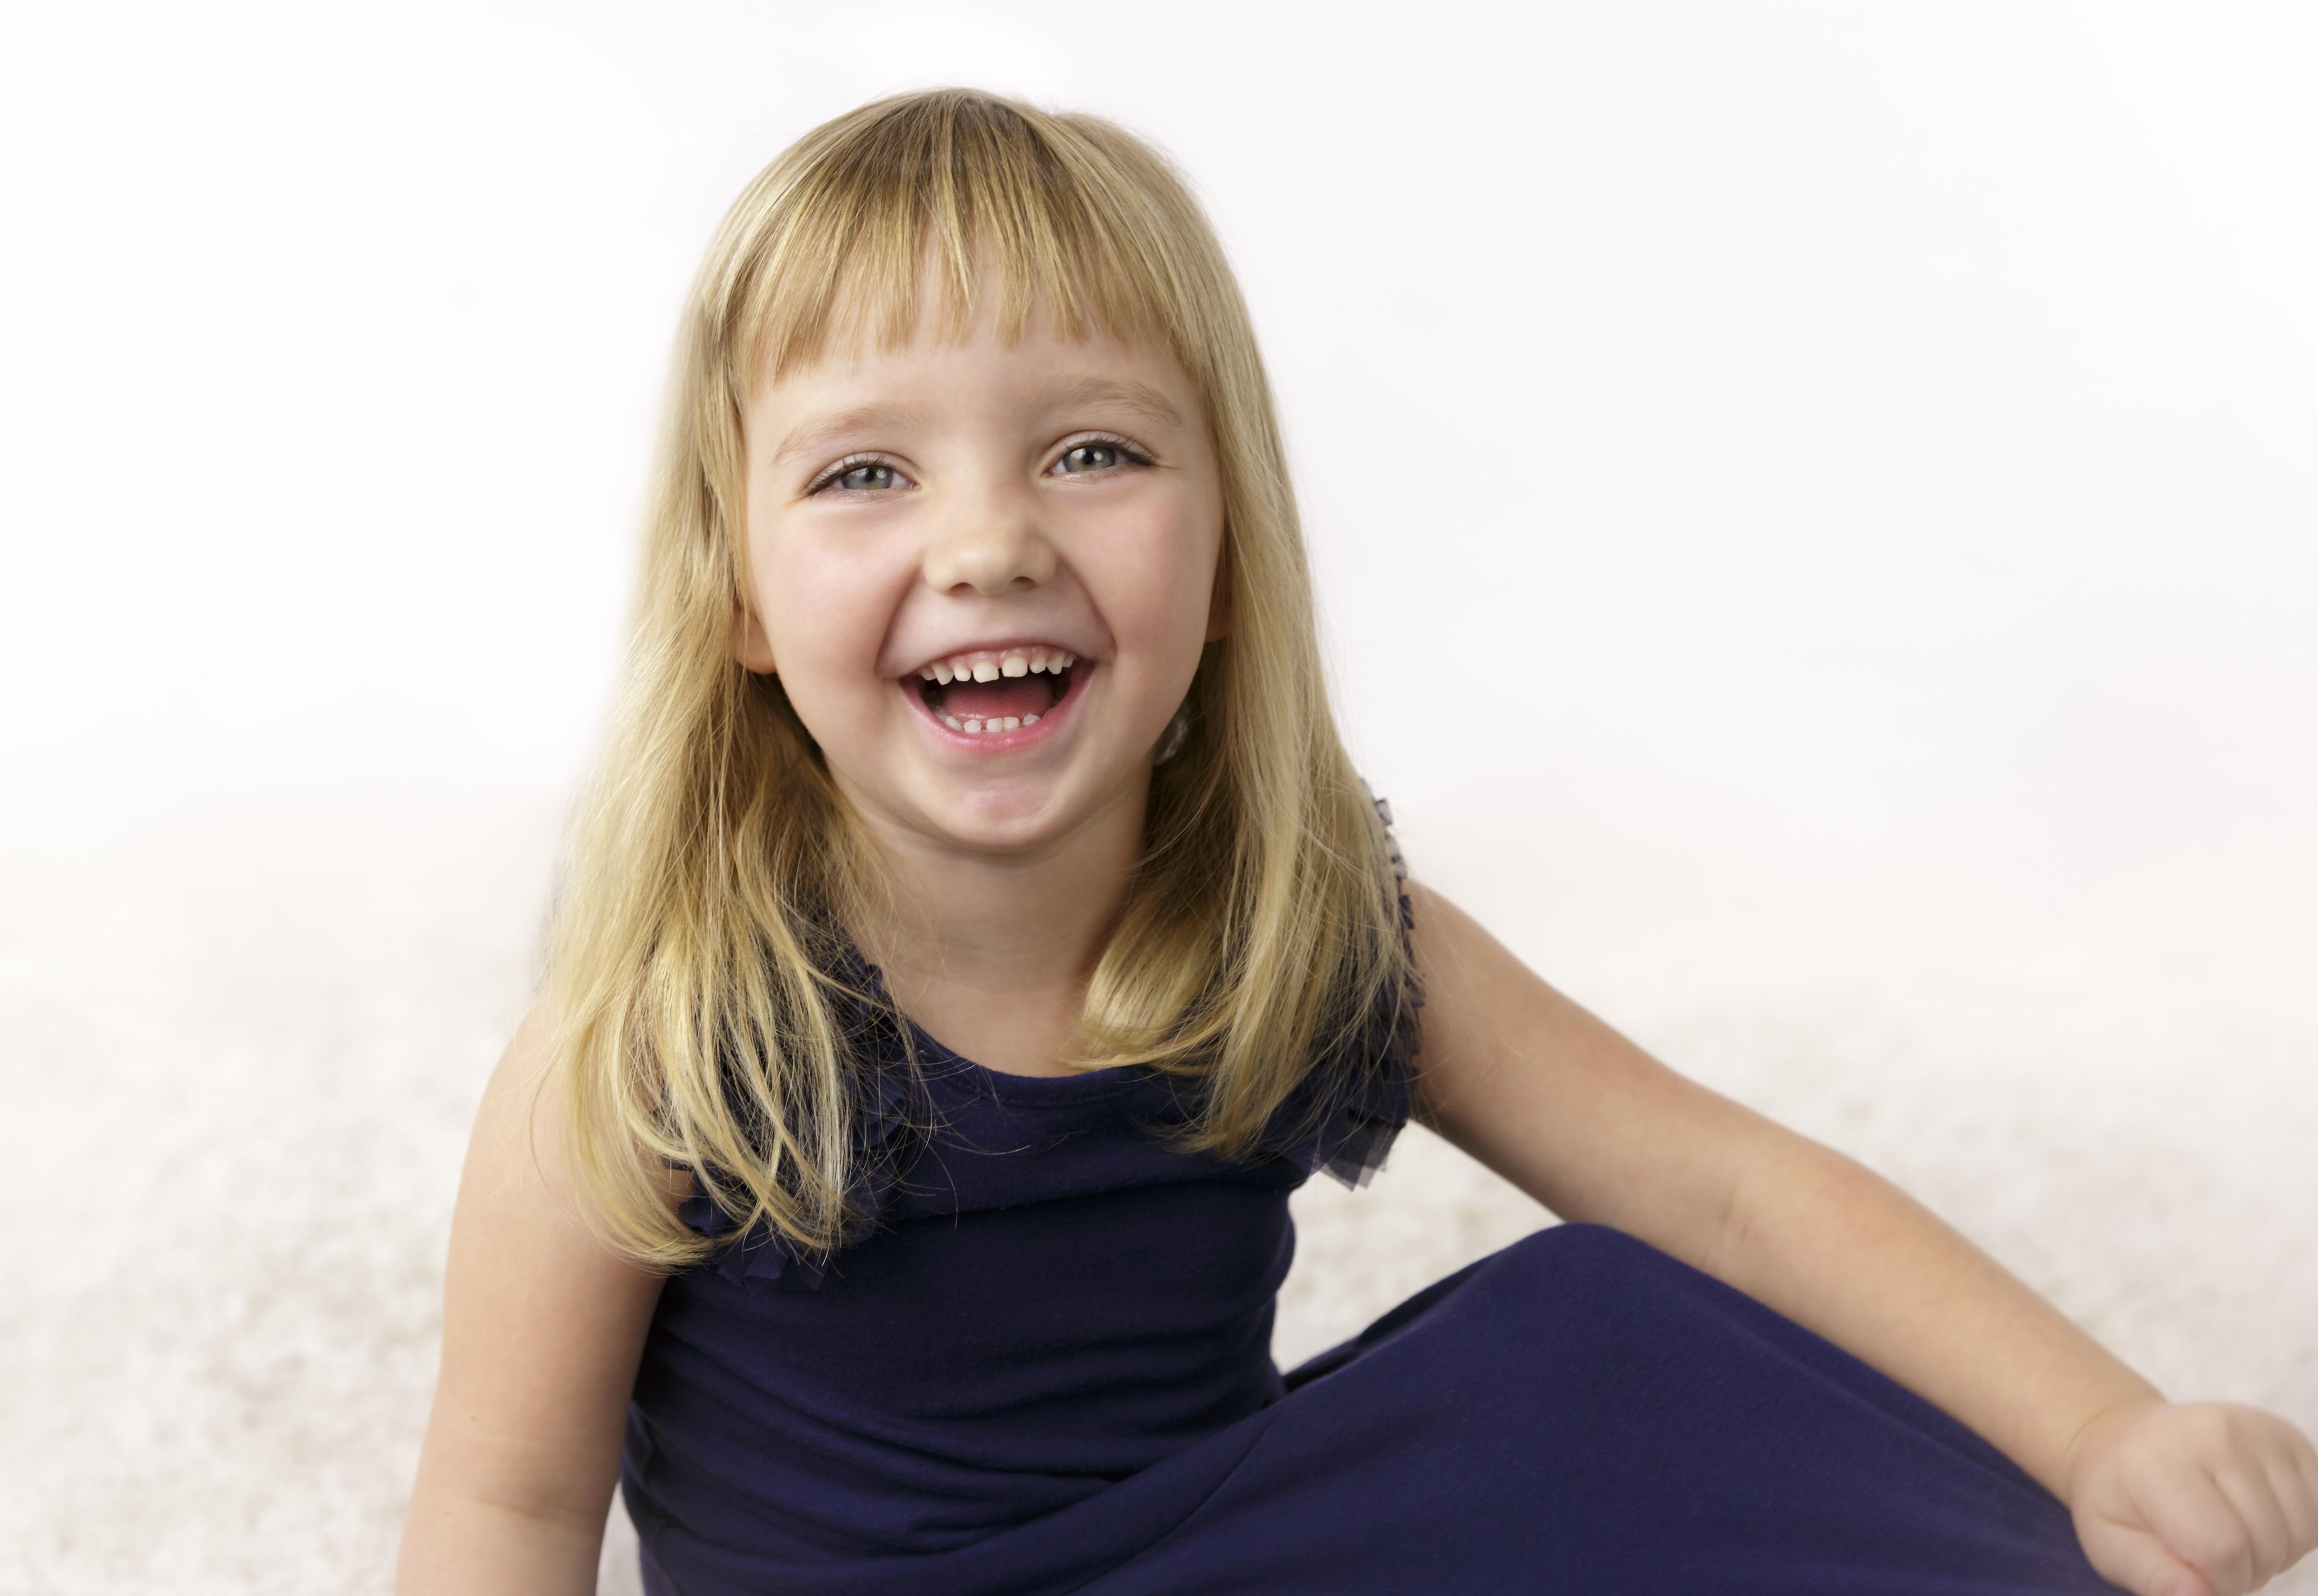 laughing girl natural photo